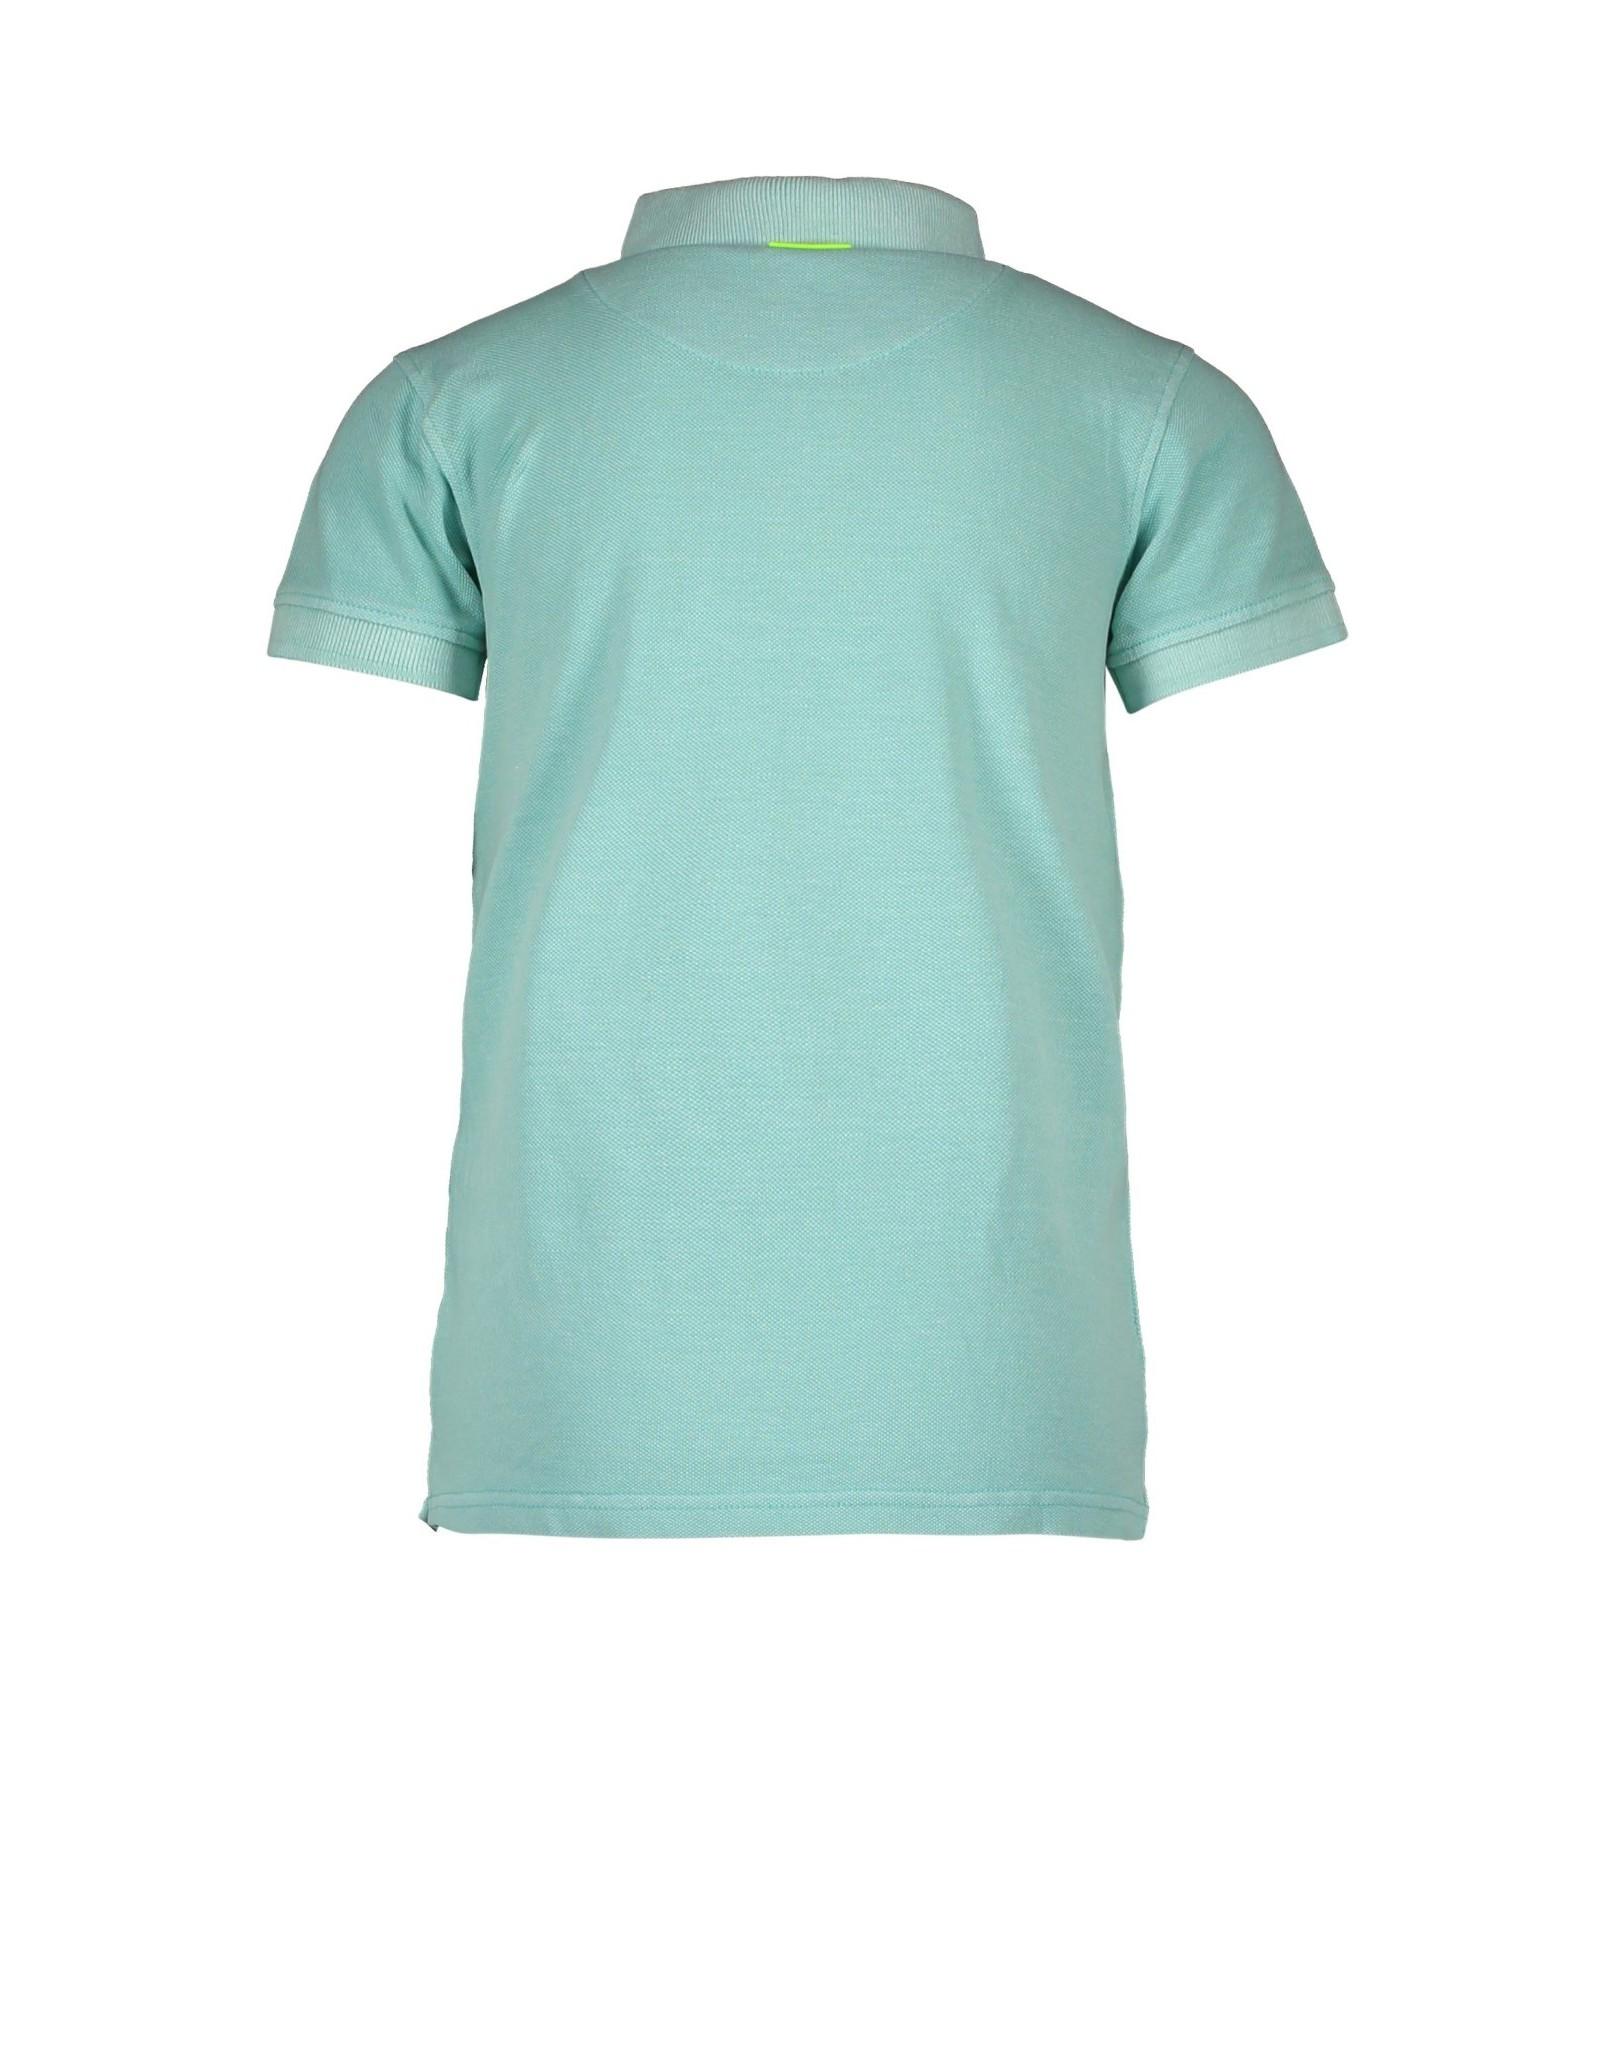 B.Nosy B.Nosy baby jongens polo t-shirt Surf Ice Green